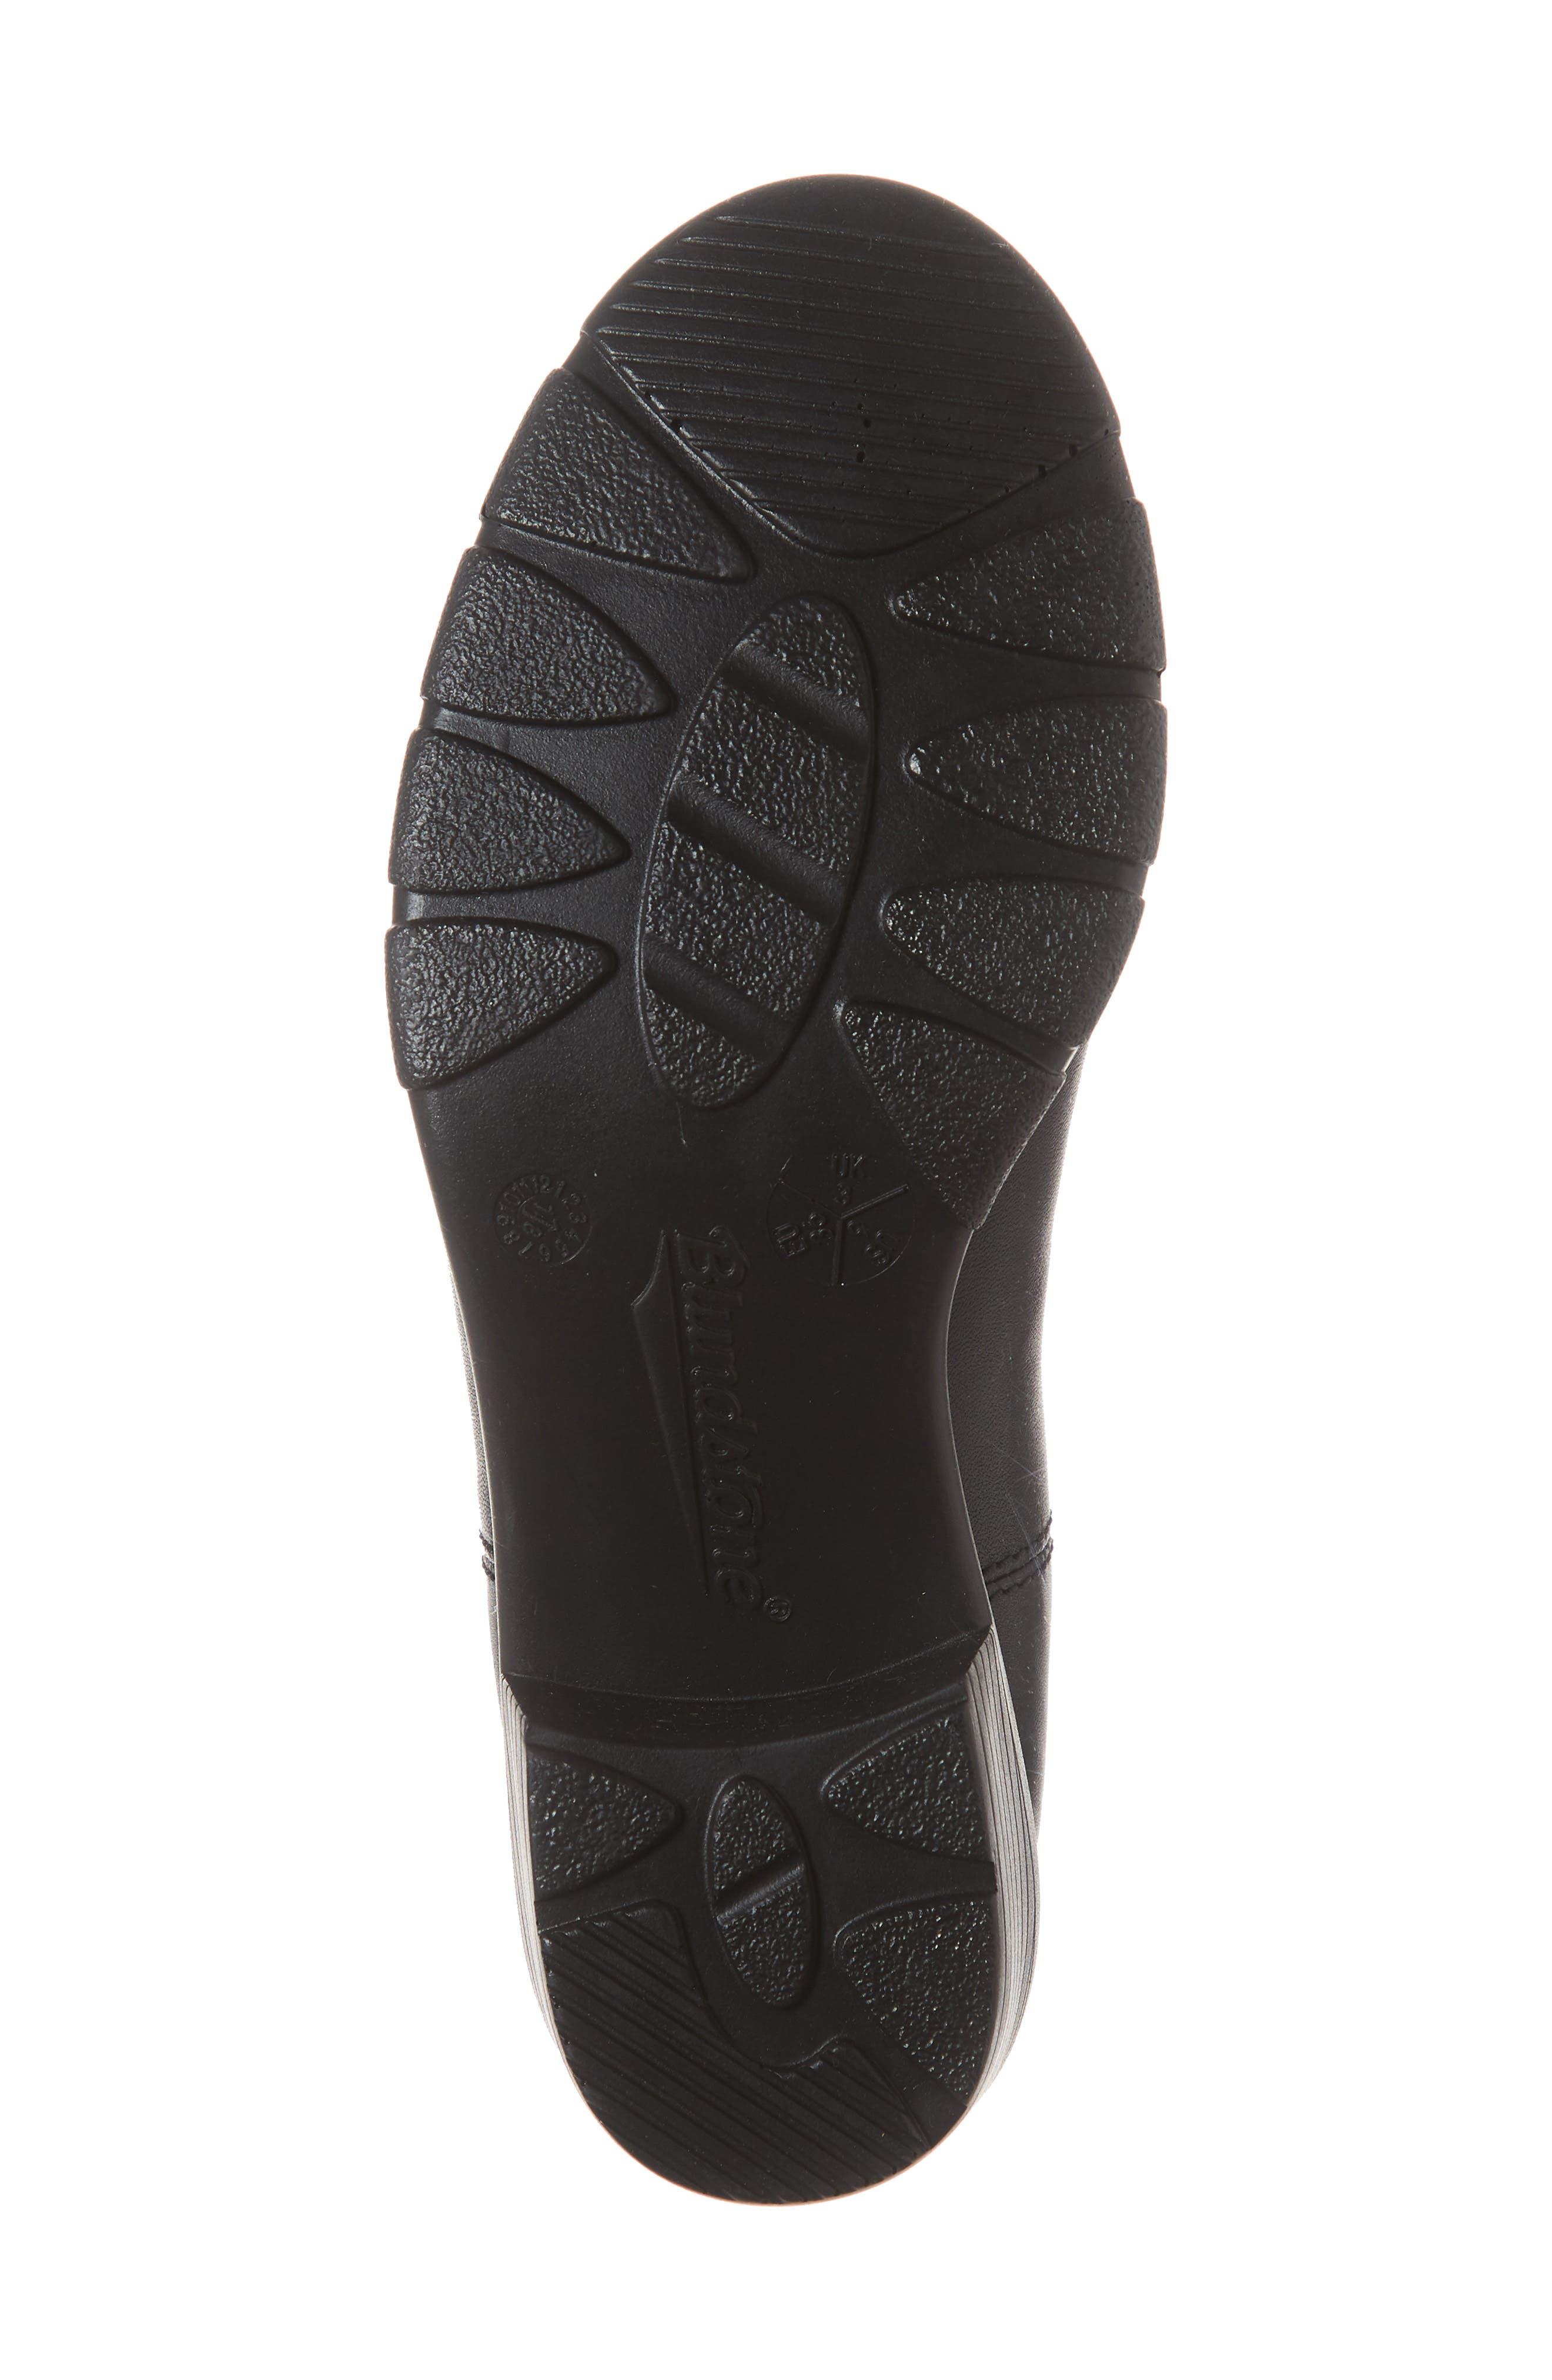 1671 Chelsea Boot,                             Alternate thumbnail 6, color,                             BLACK LEATHER